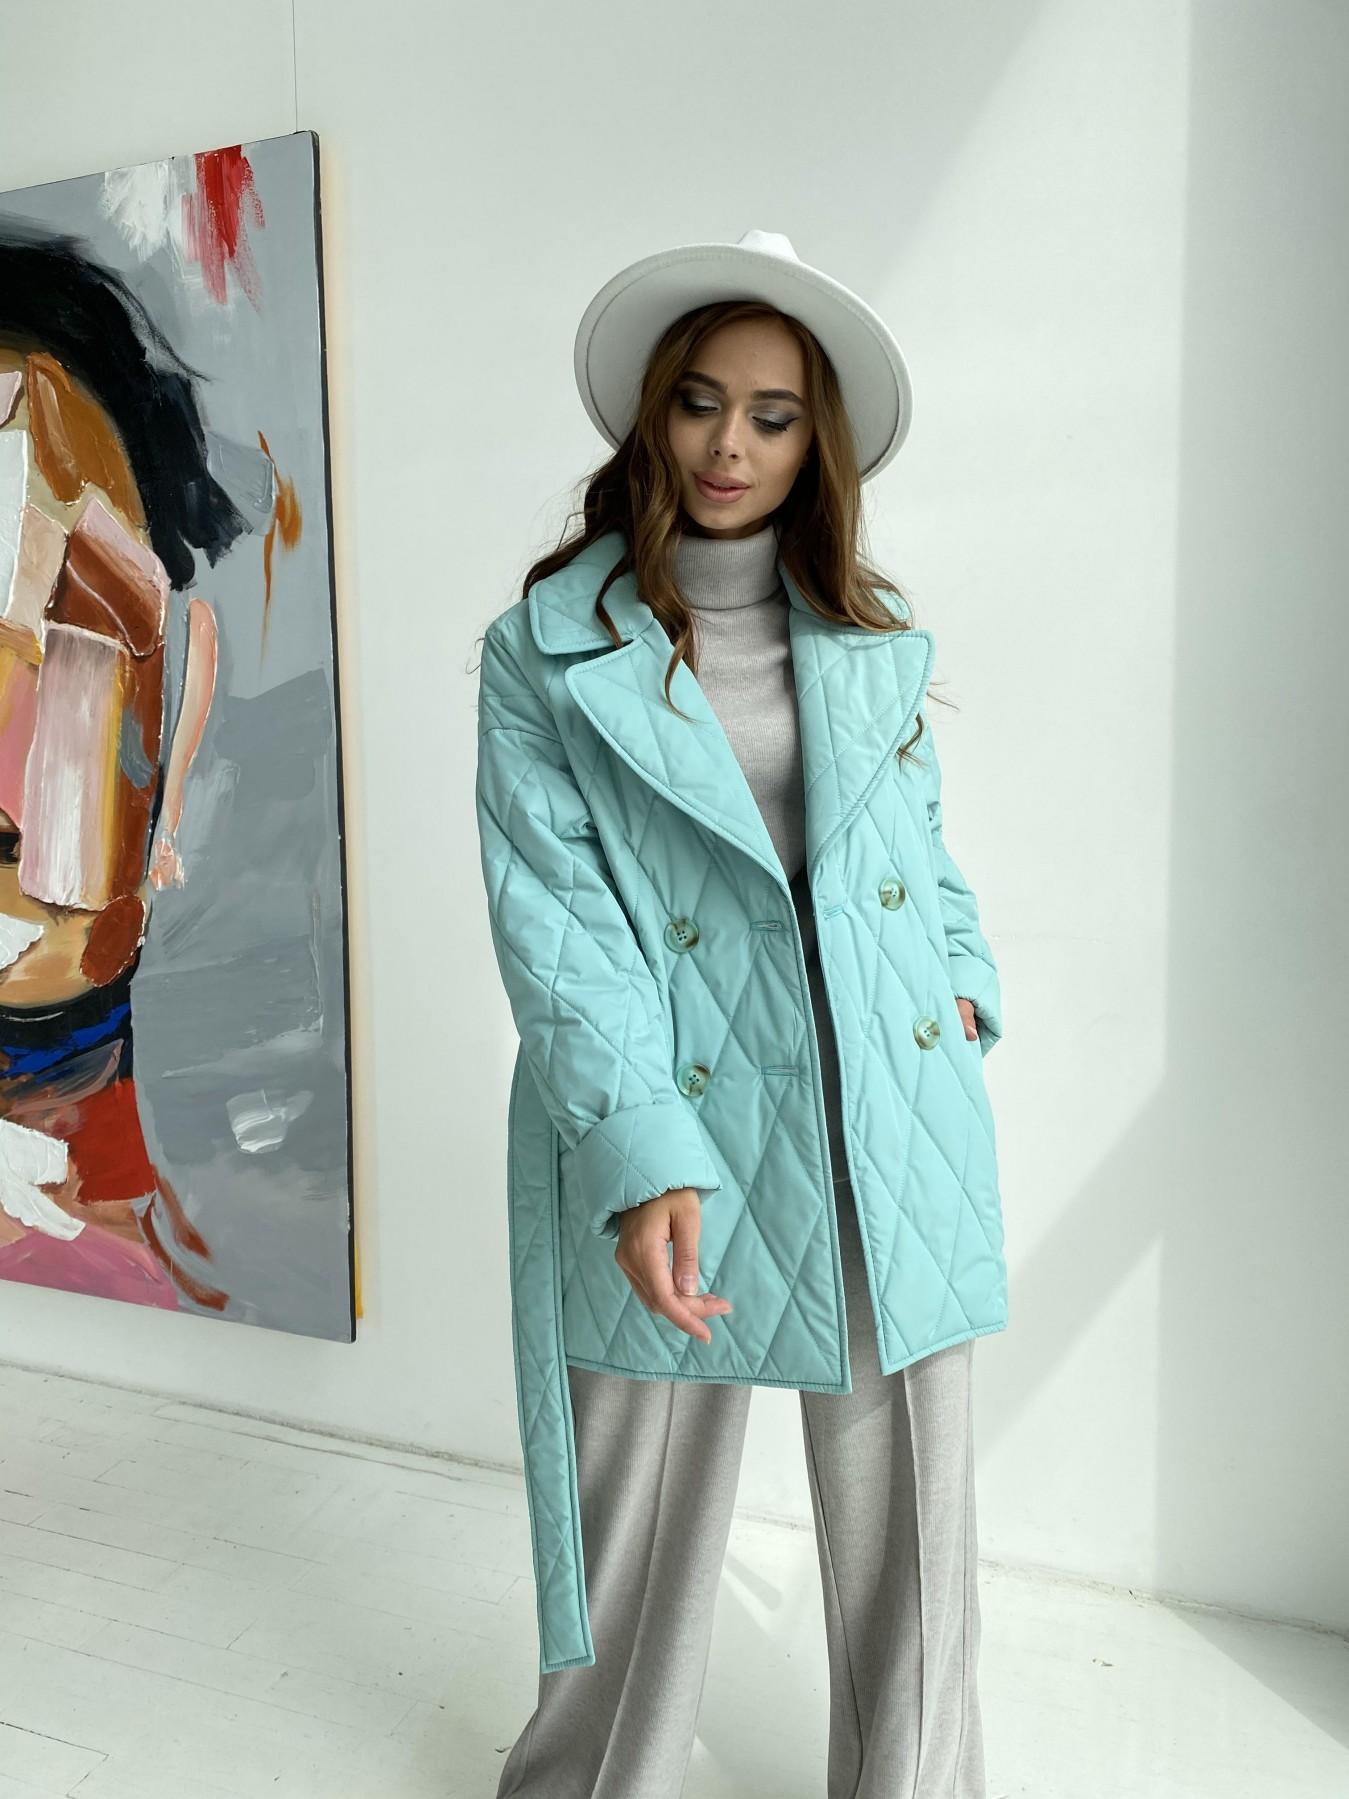 Норд стеганая куртка из плащеки 11770  АРТ. 48511 Цвет: Олива 2 - фото 4, интернет магазин tm-modus.ru